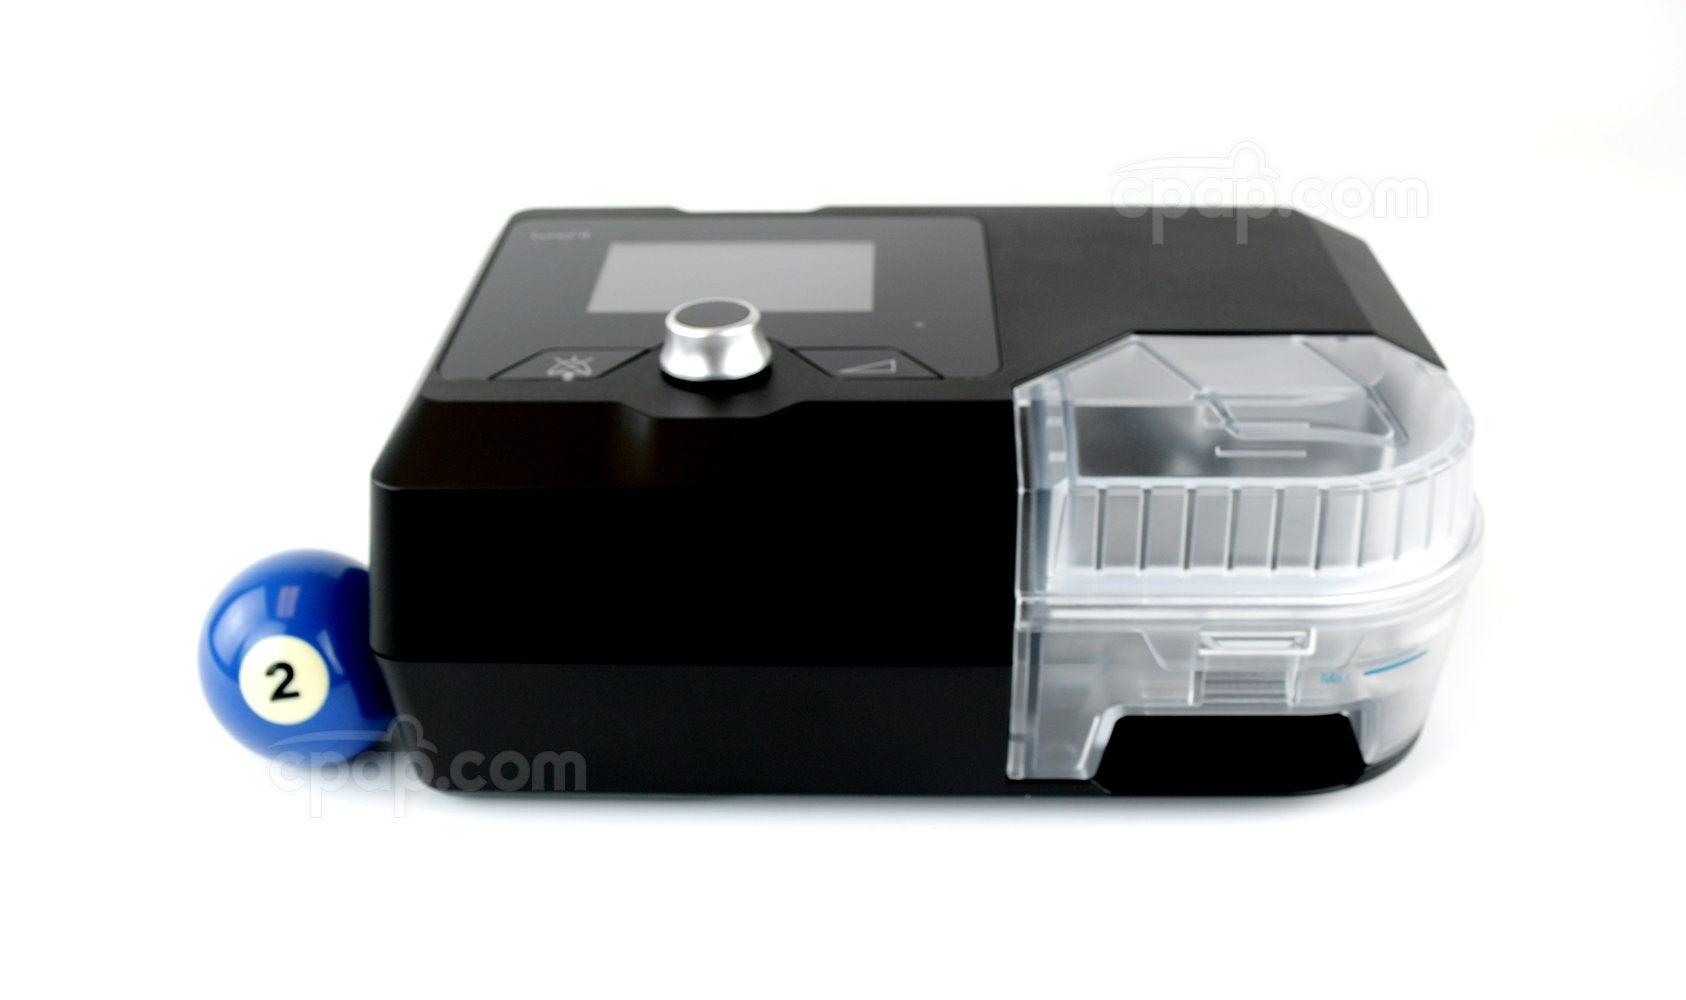 Luna II Auto CPAP Machine - Billiards Ball Not Included